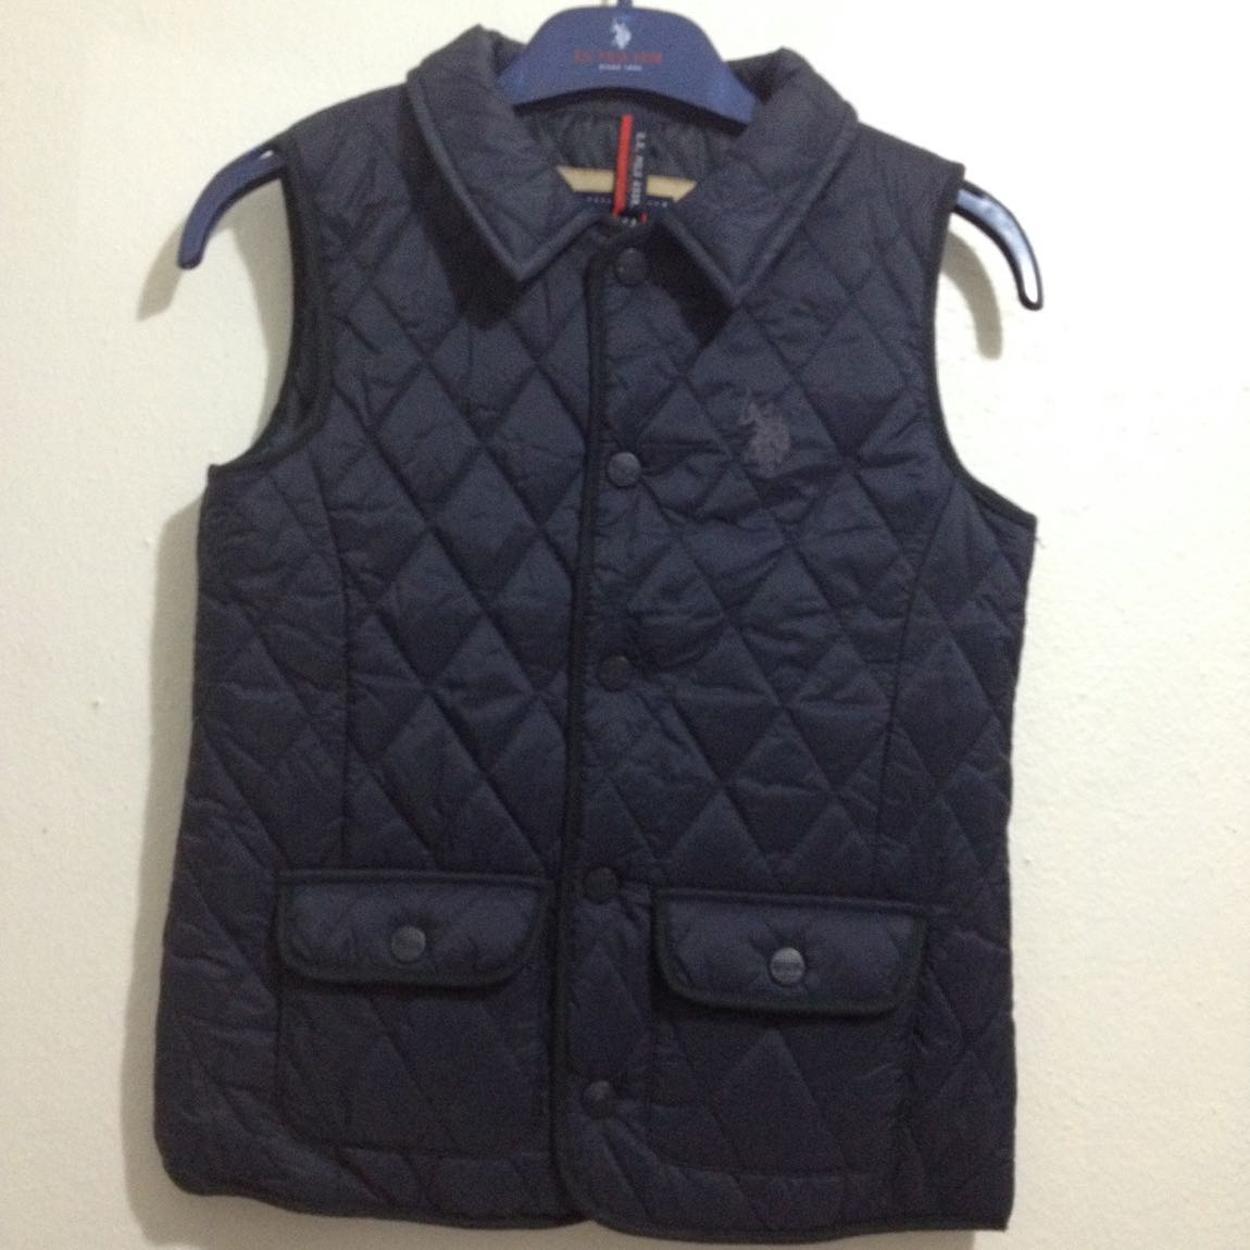 U.S.Polo Assn. Ceket & Yelek